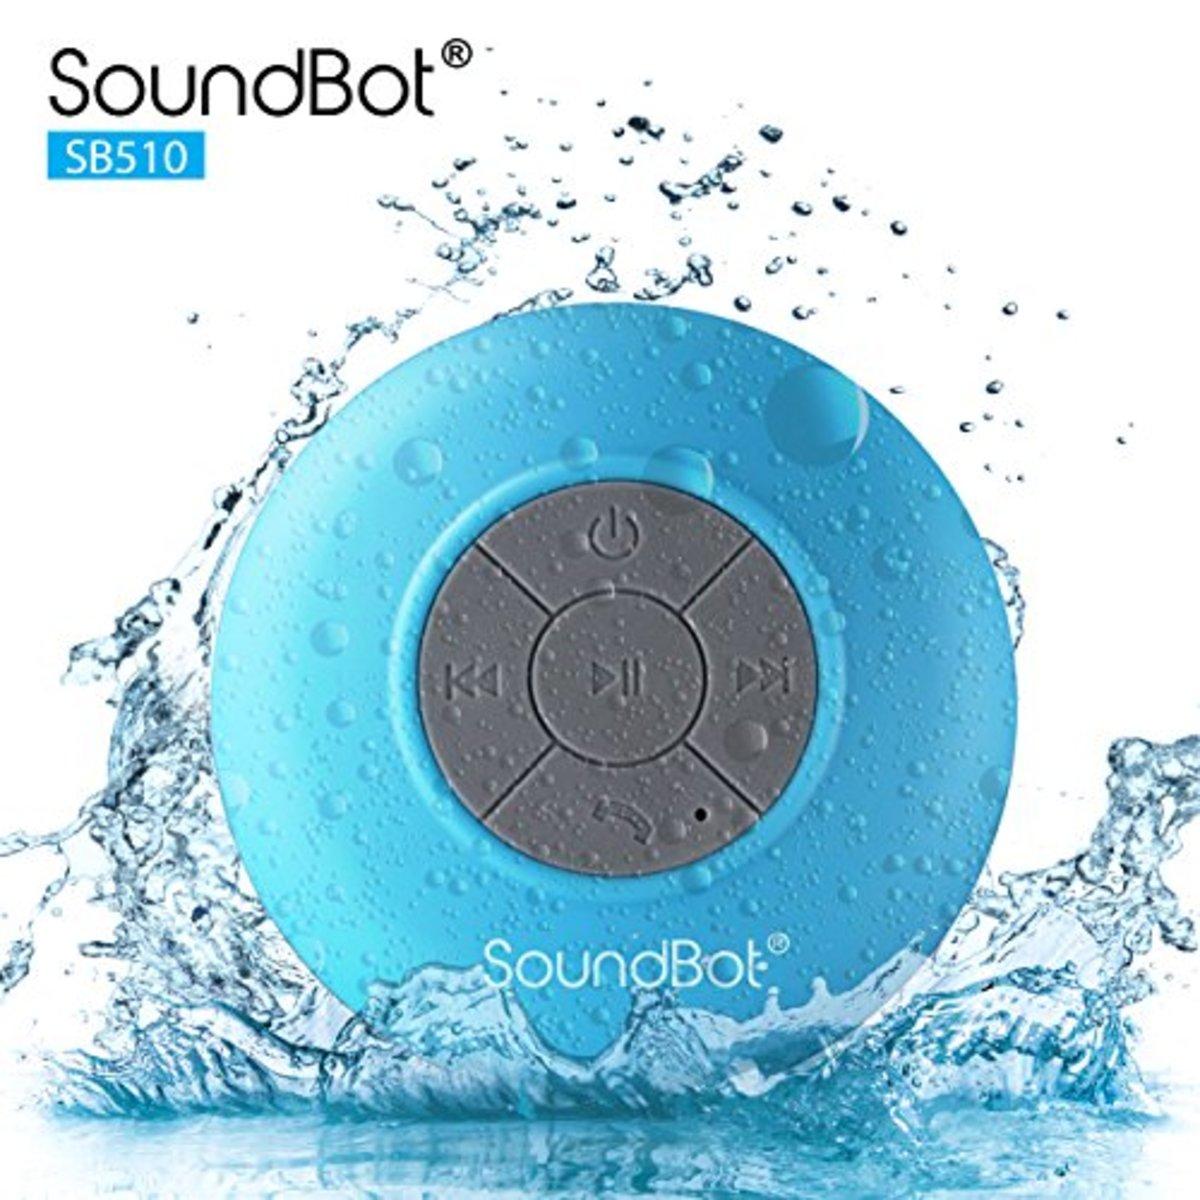 SoundBot SB510 Bluetooth Speaker